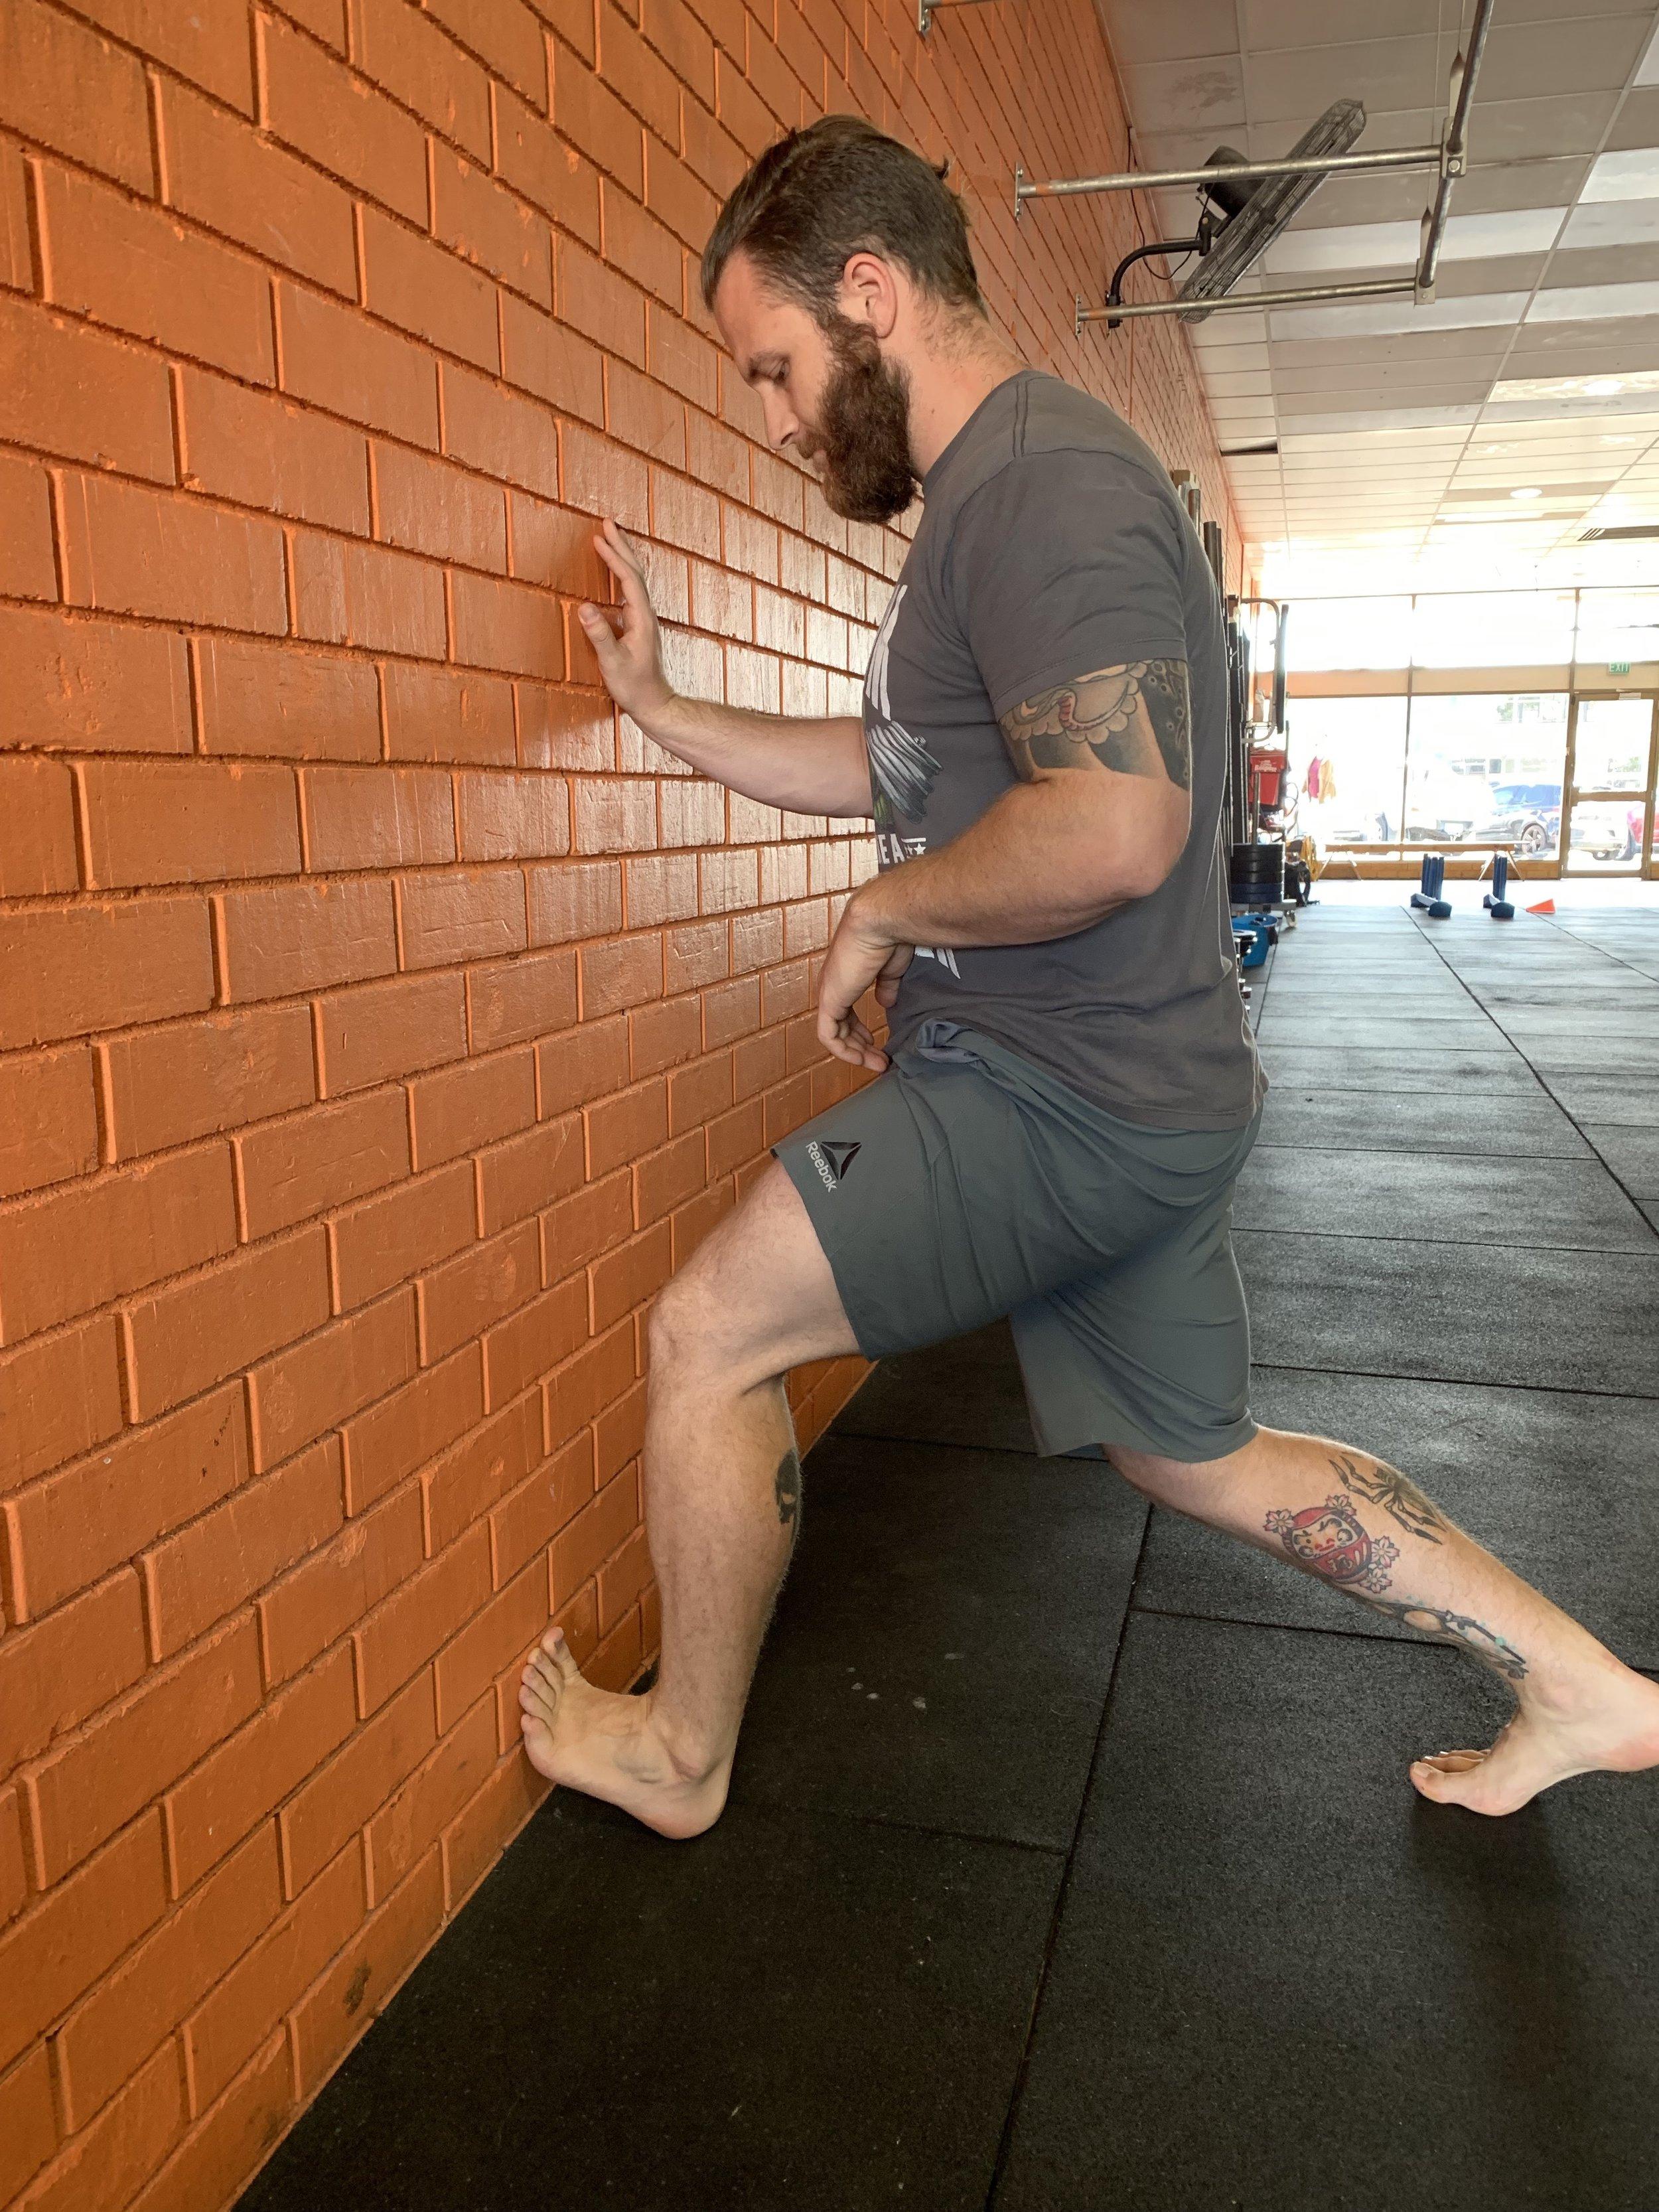 Stretching the soleus